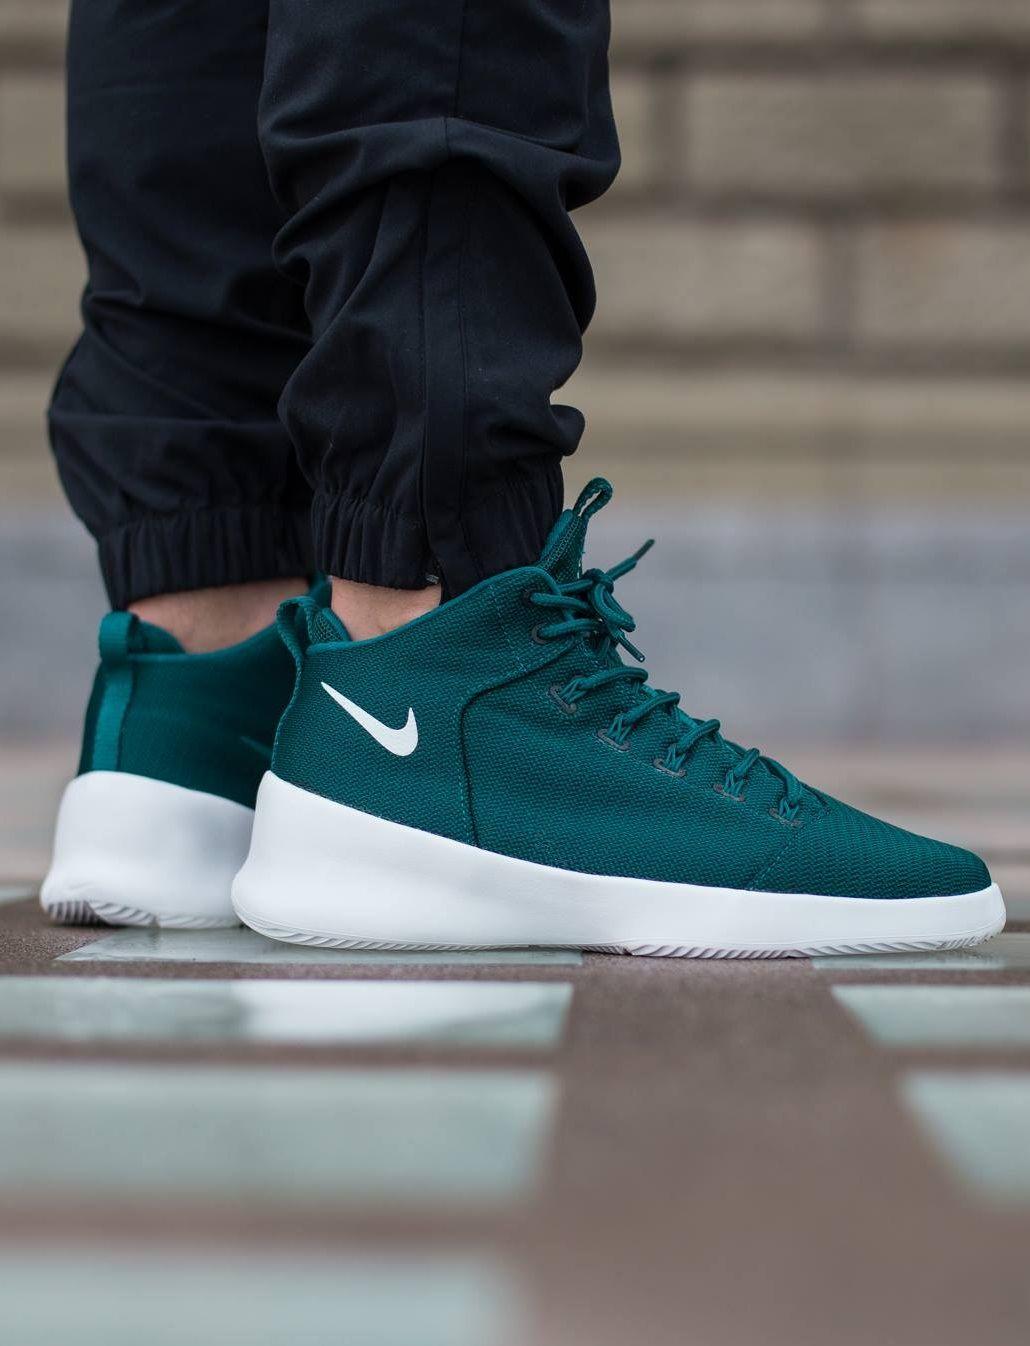 7fce9509e14260 Nike Hyperfr3sh  Green